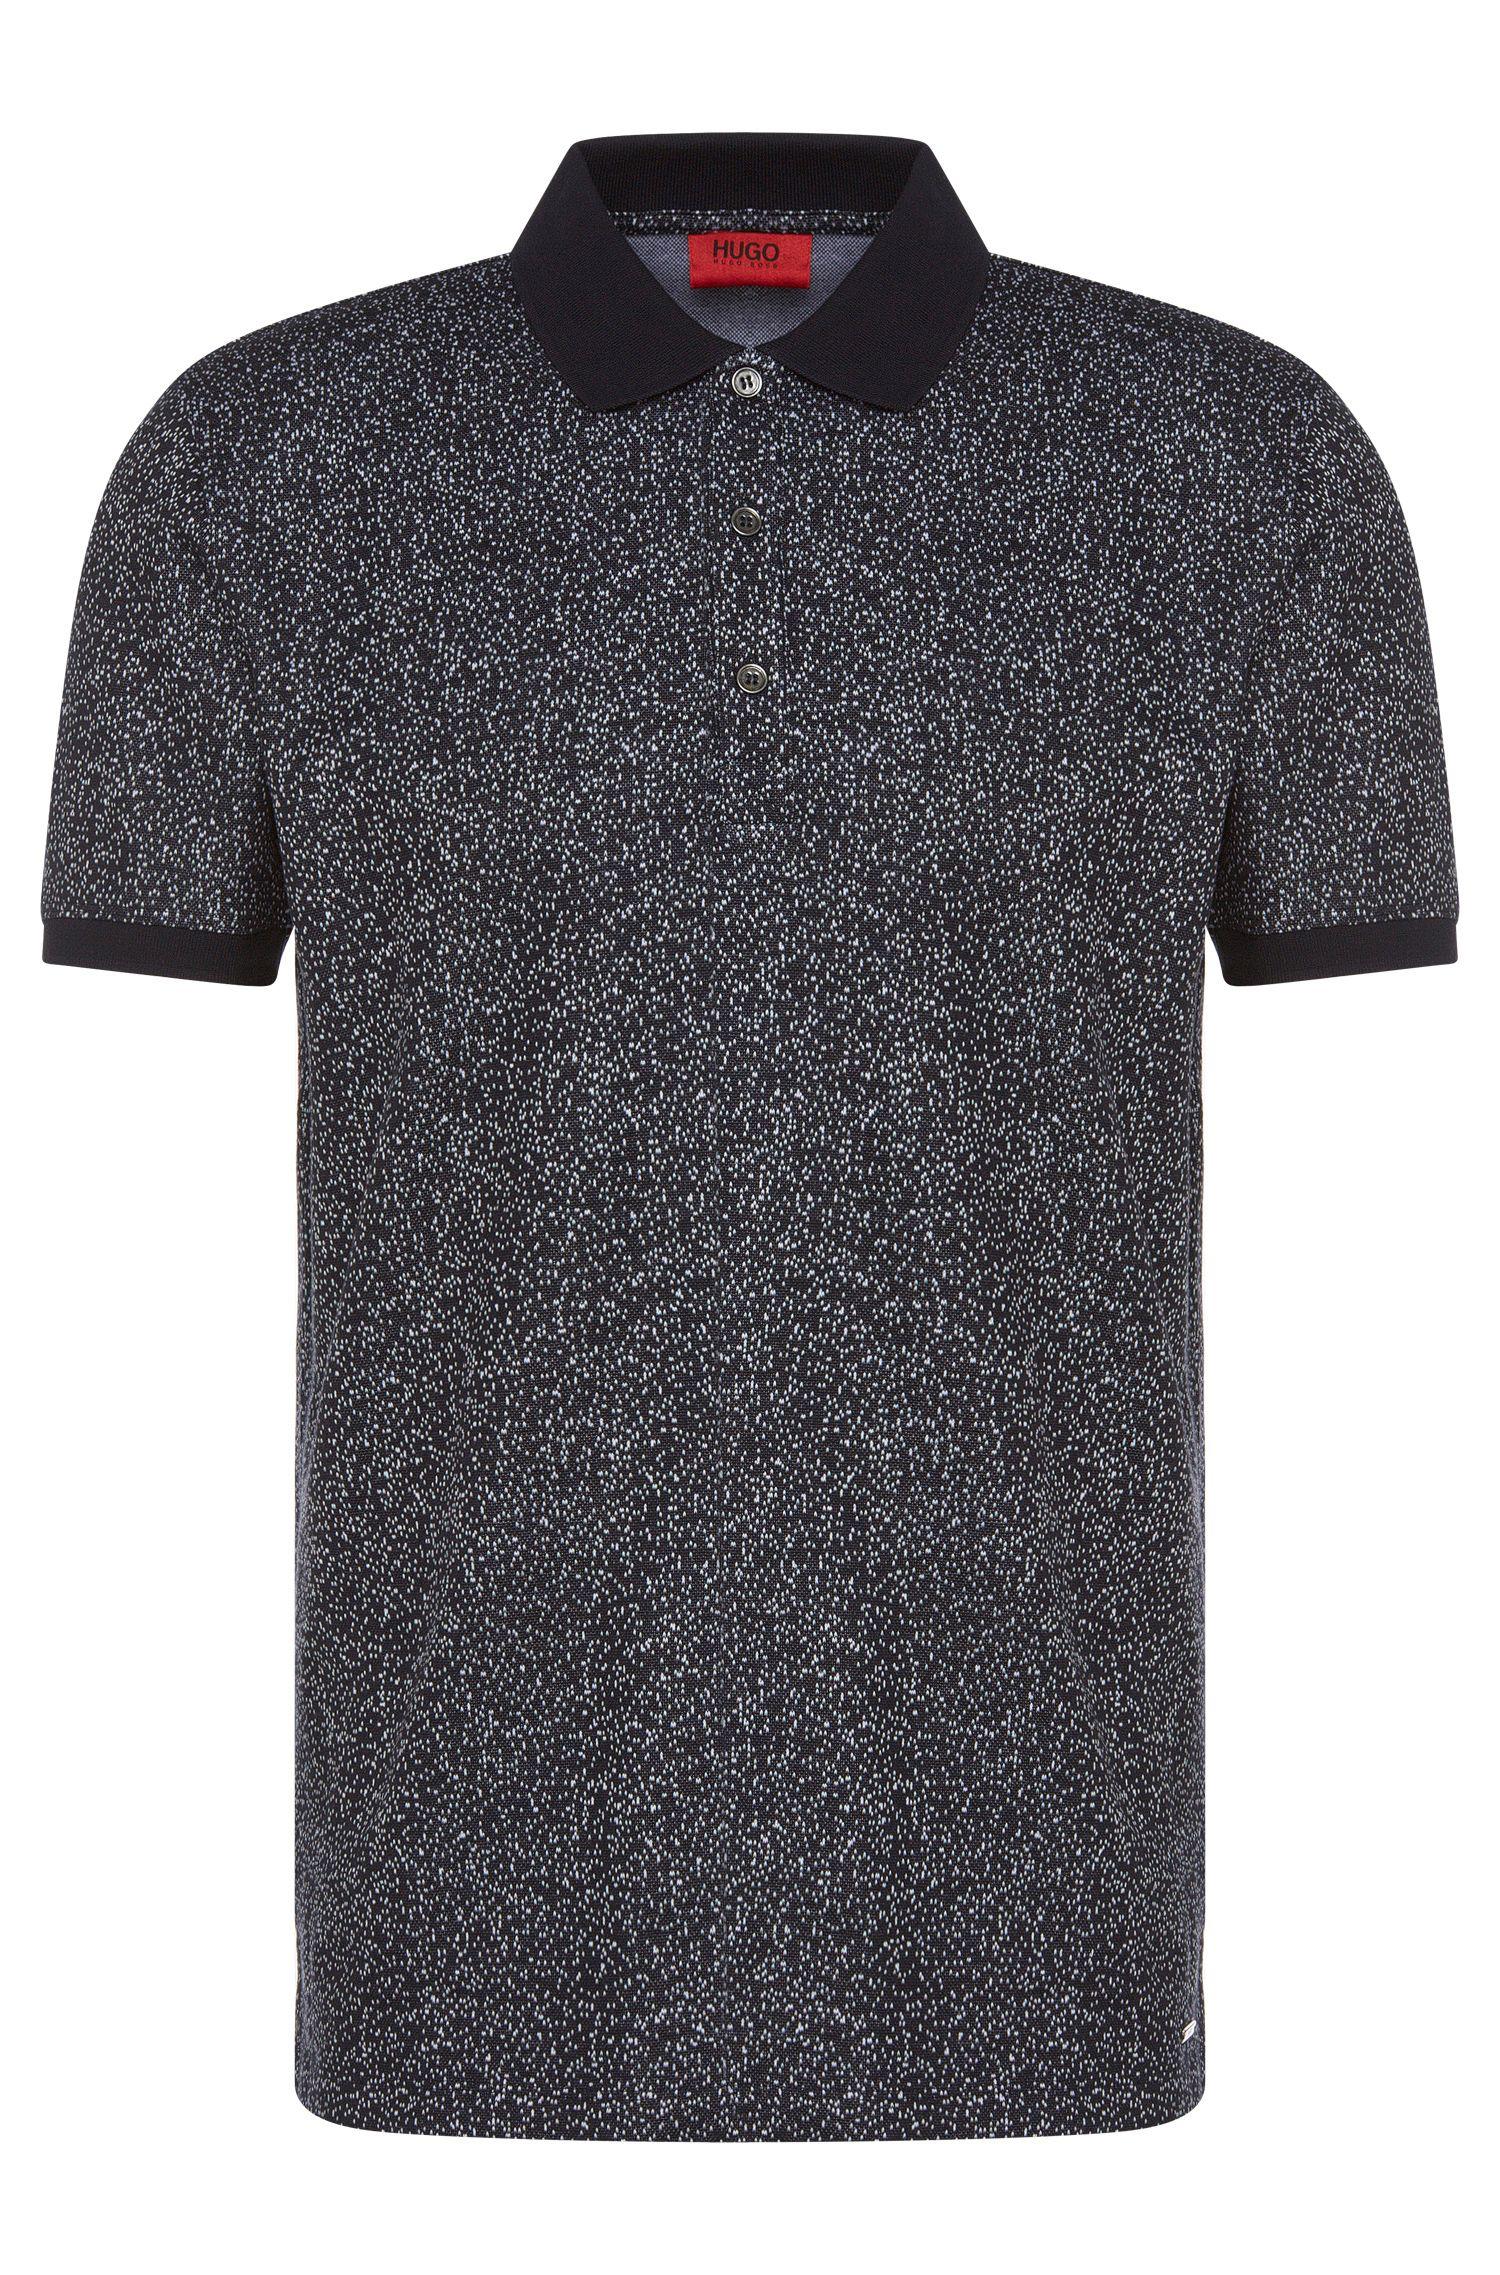 'Dinello' | Slim Fit, Cotton Jacquard Polo Shirt